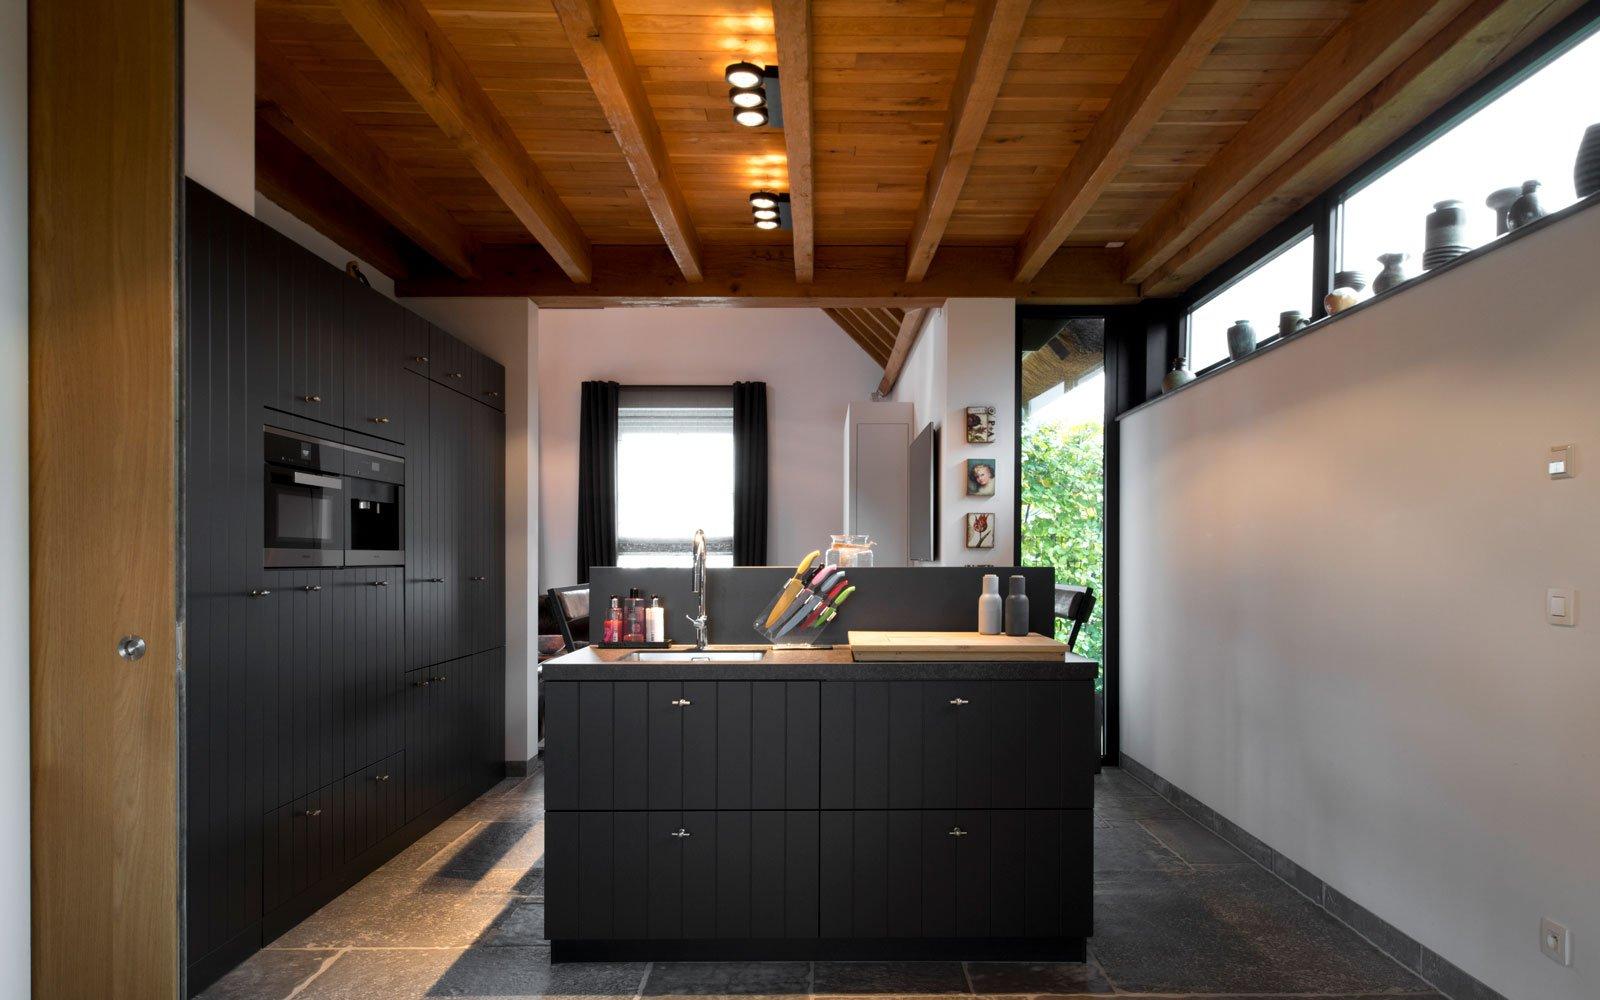 Keuken, inbouwkeuken, Bouwcenter Nelemans, houten plafond, modern gastenverblijf, VVR Architecten